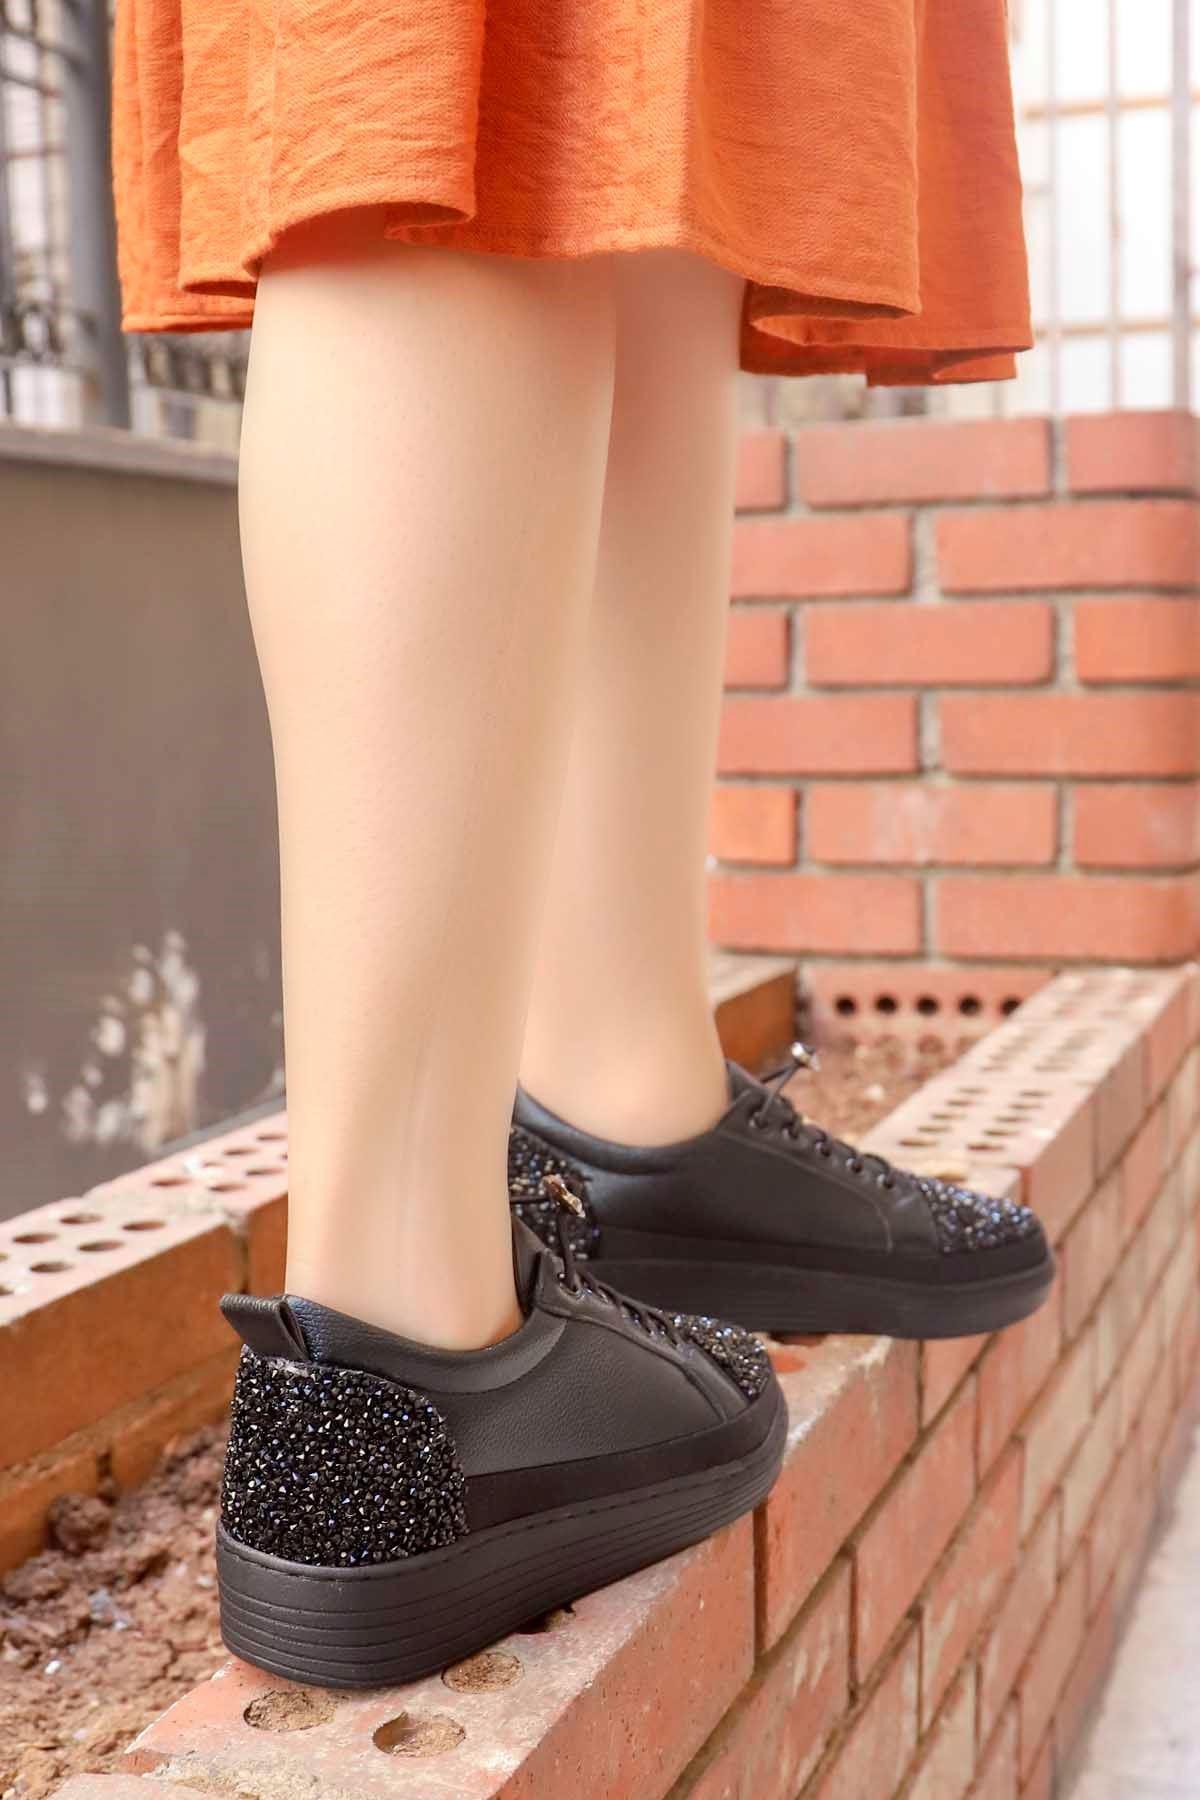 mami-077 Taş Detay Spor Ayakkabı Siyah Deri